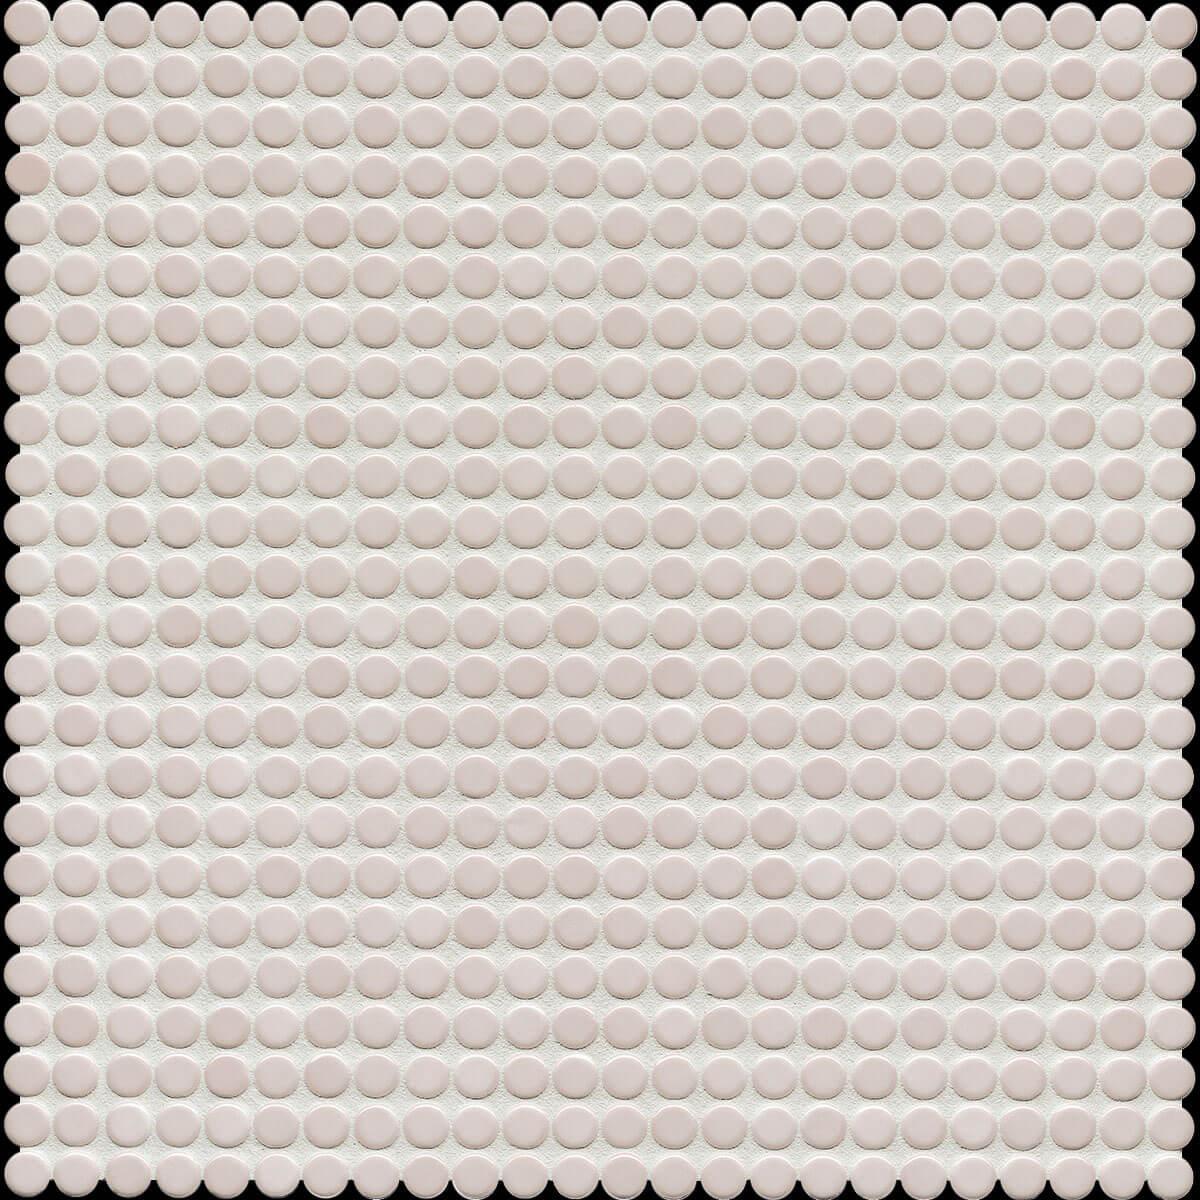 Agrob Buchtal Tiles - KLAY_Loop-_0012_40002H